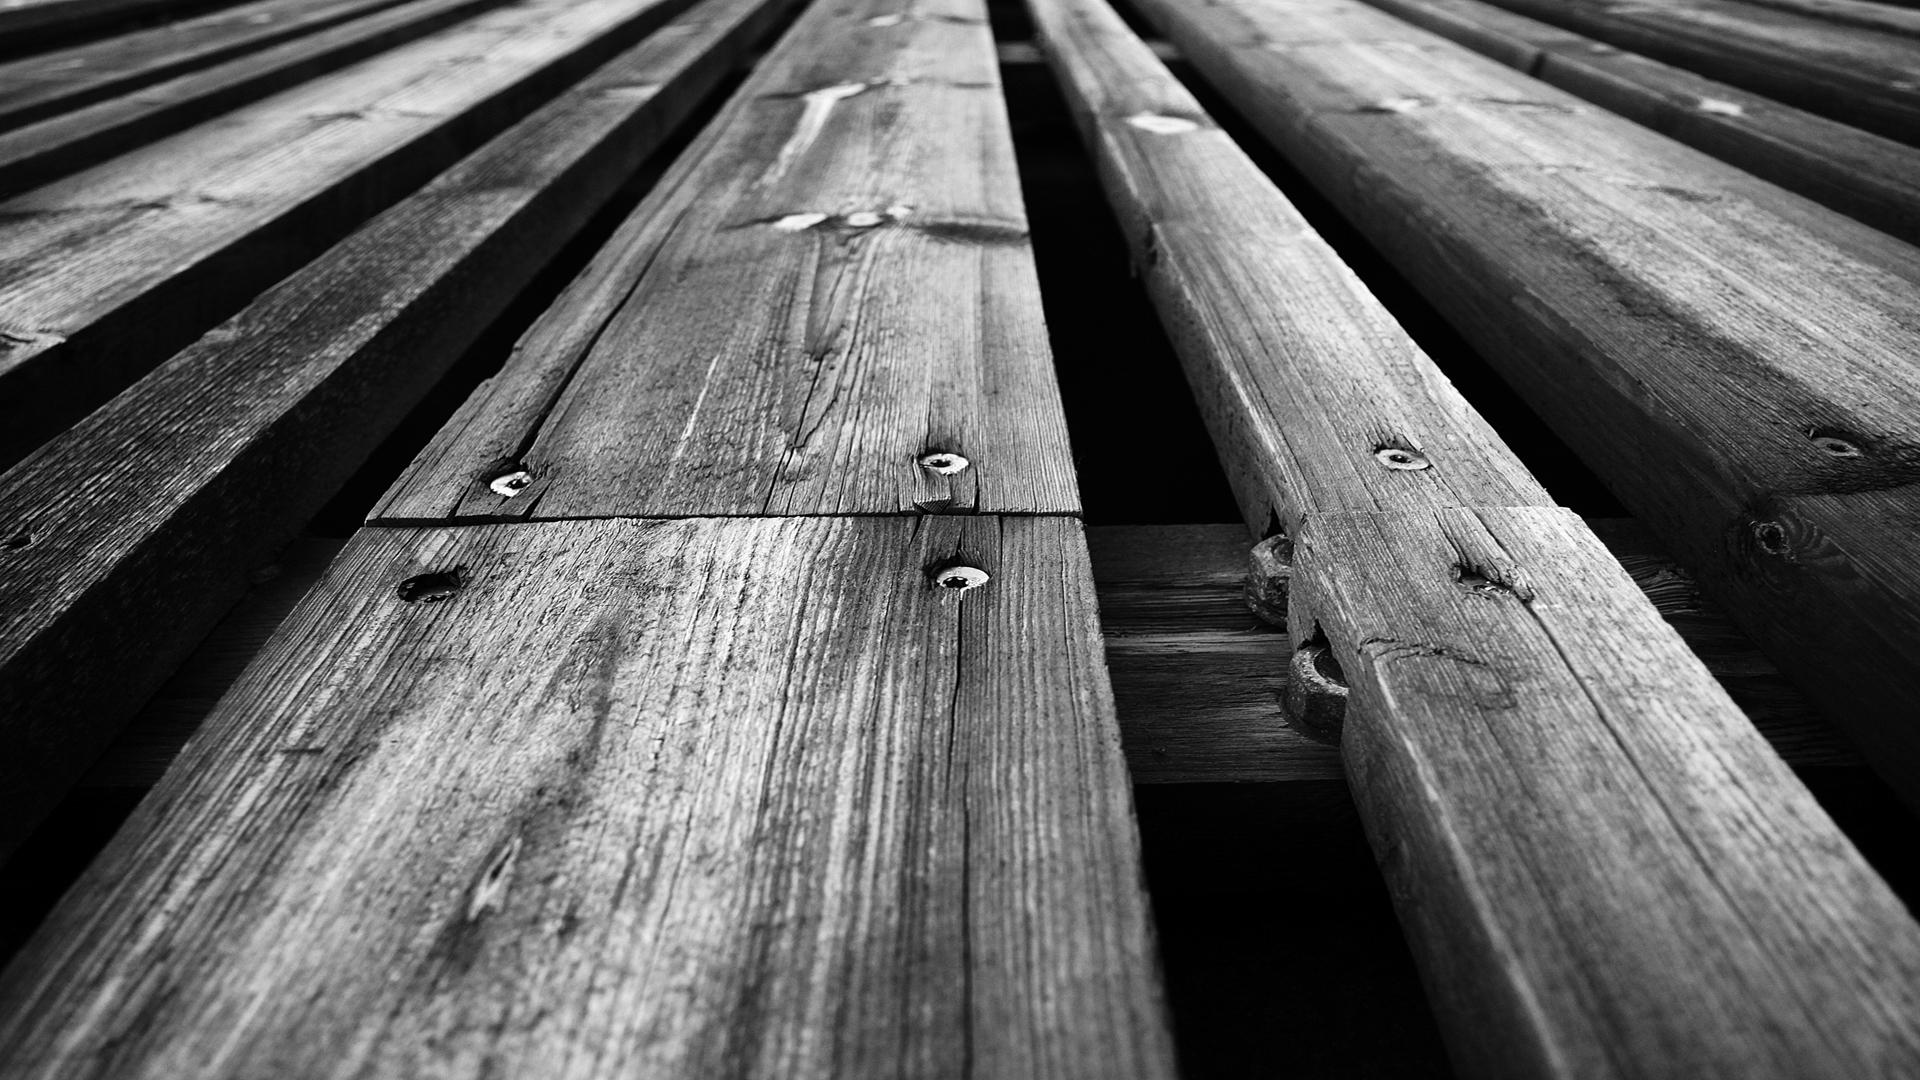 wooden floor black and white high definition desktop wallpaper 1920x1080